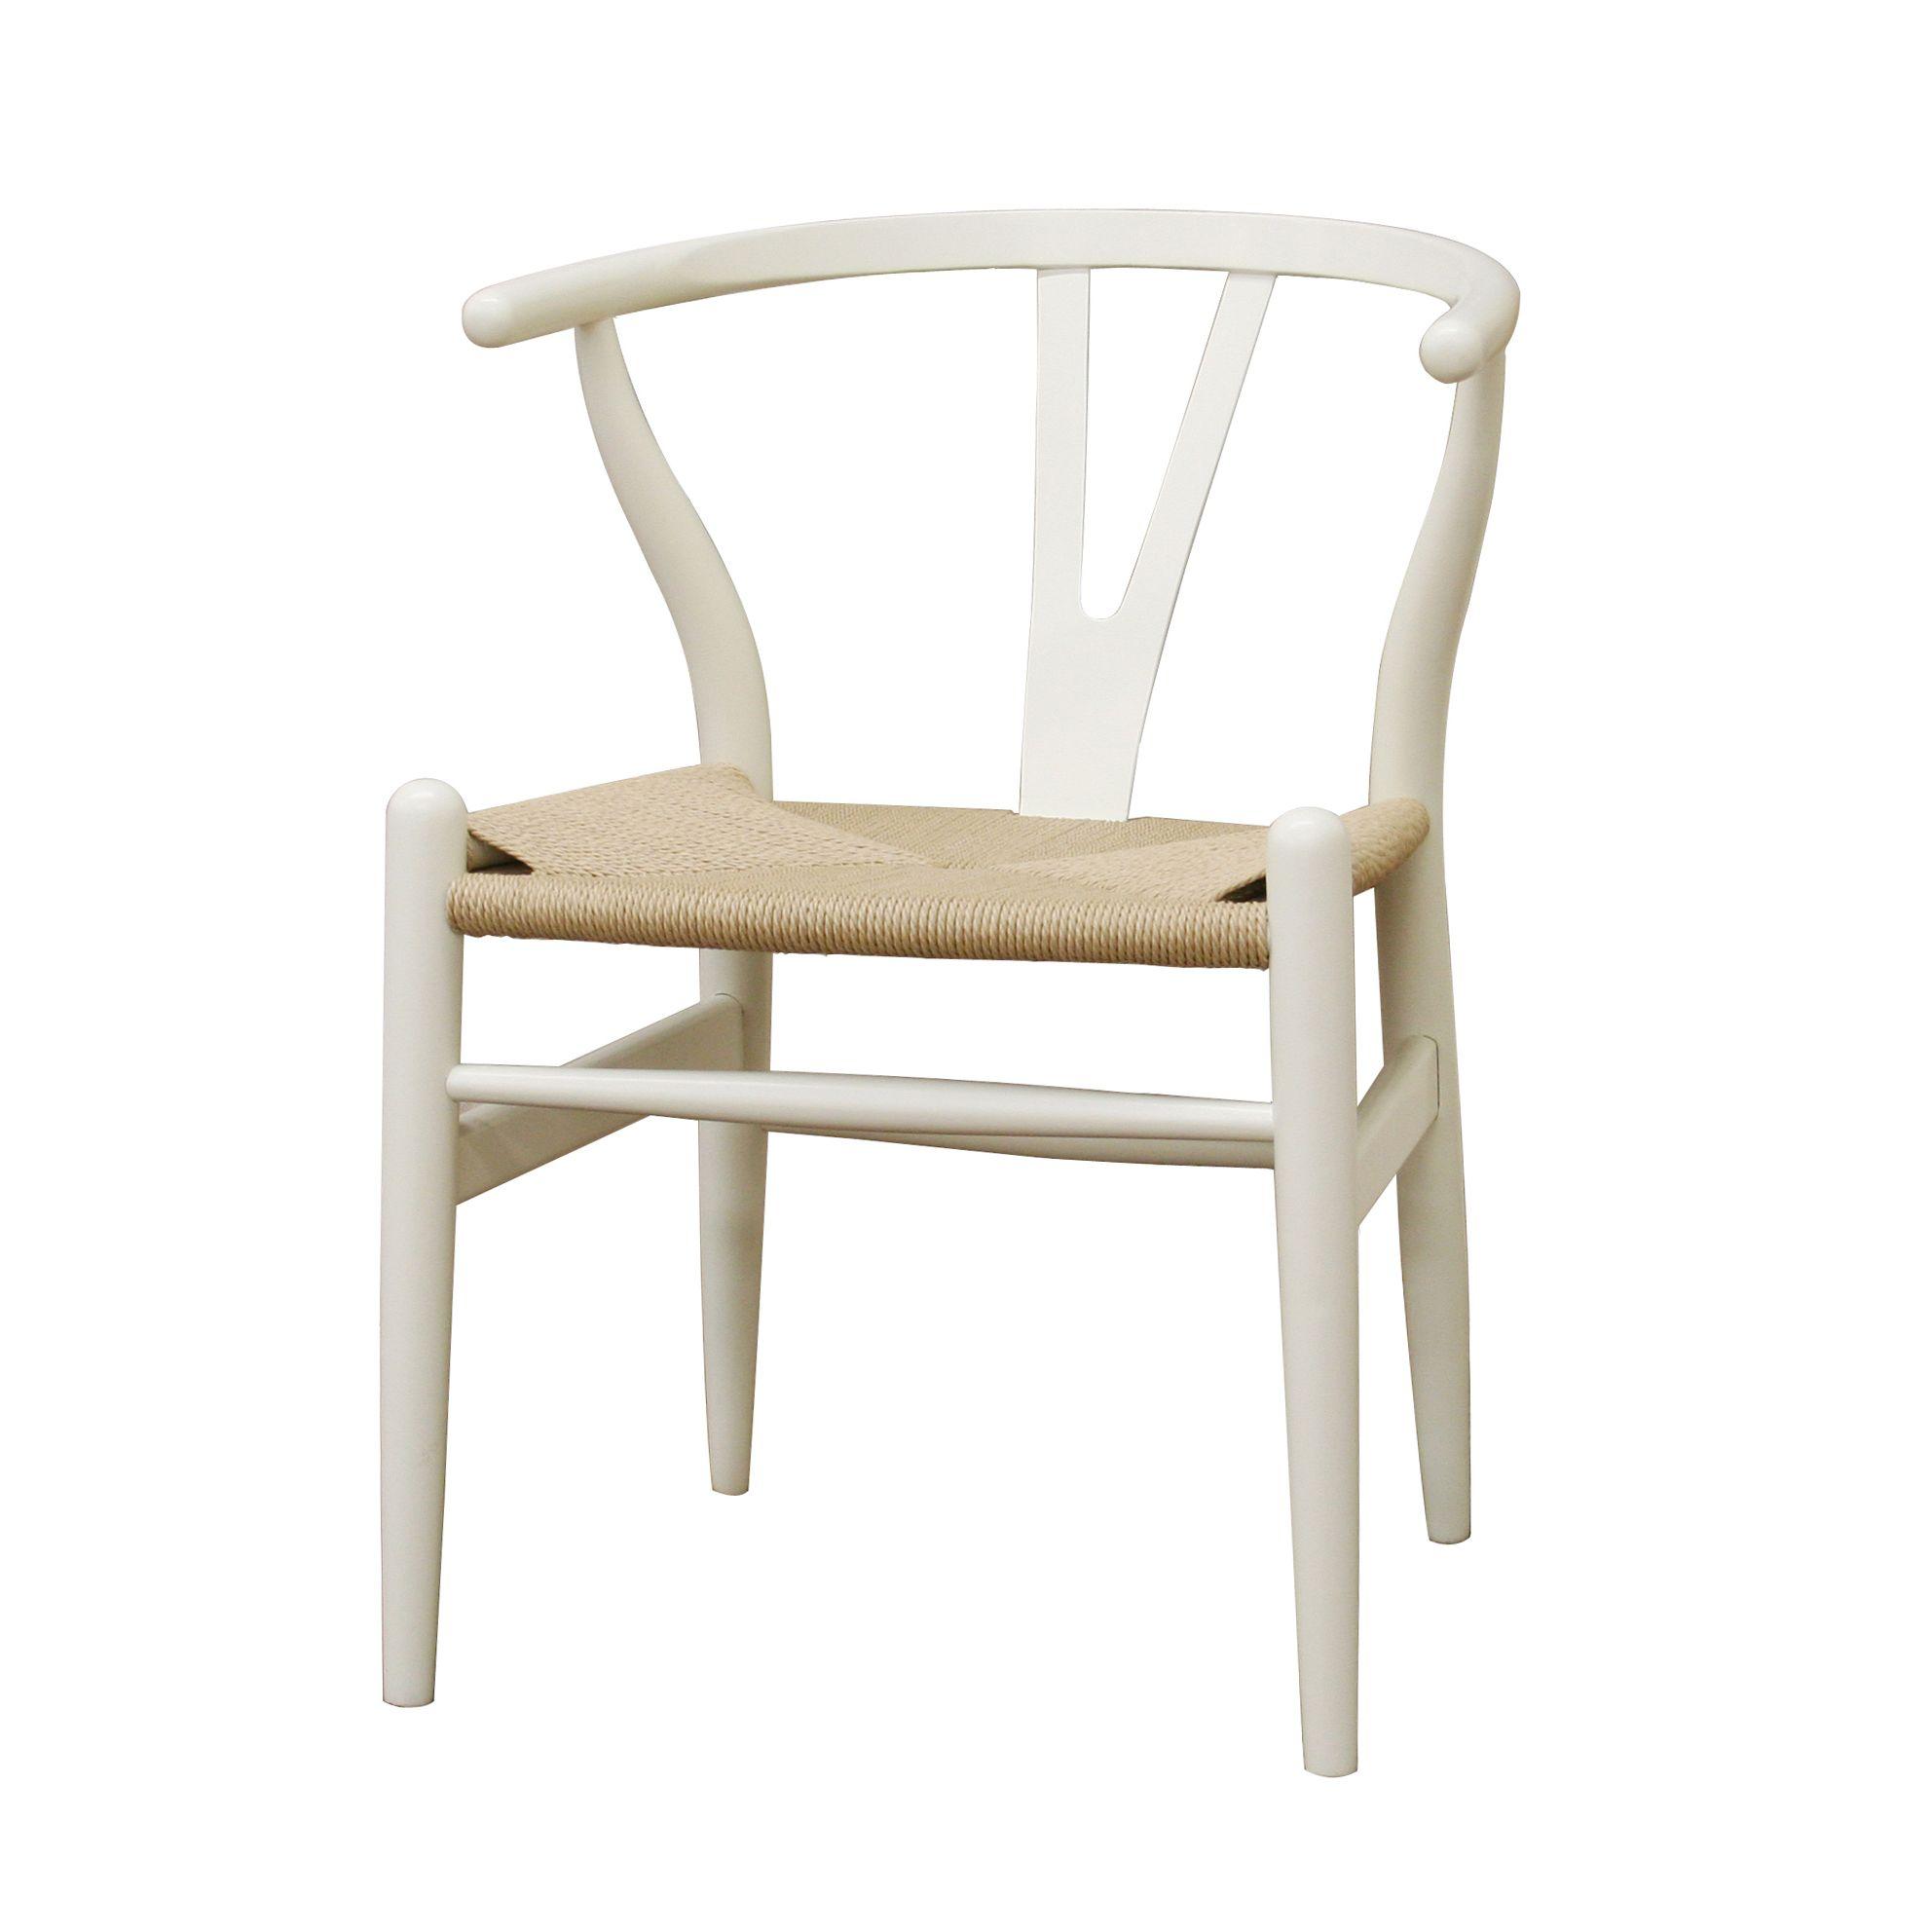 Baxton Studio Wishbone Modern White Wood Dining Chair with Light ...